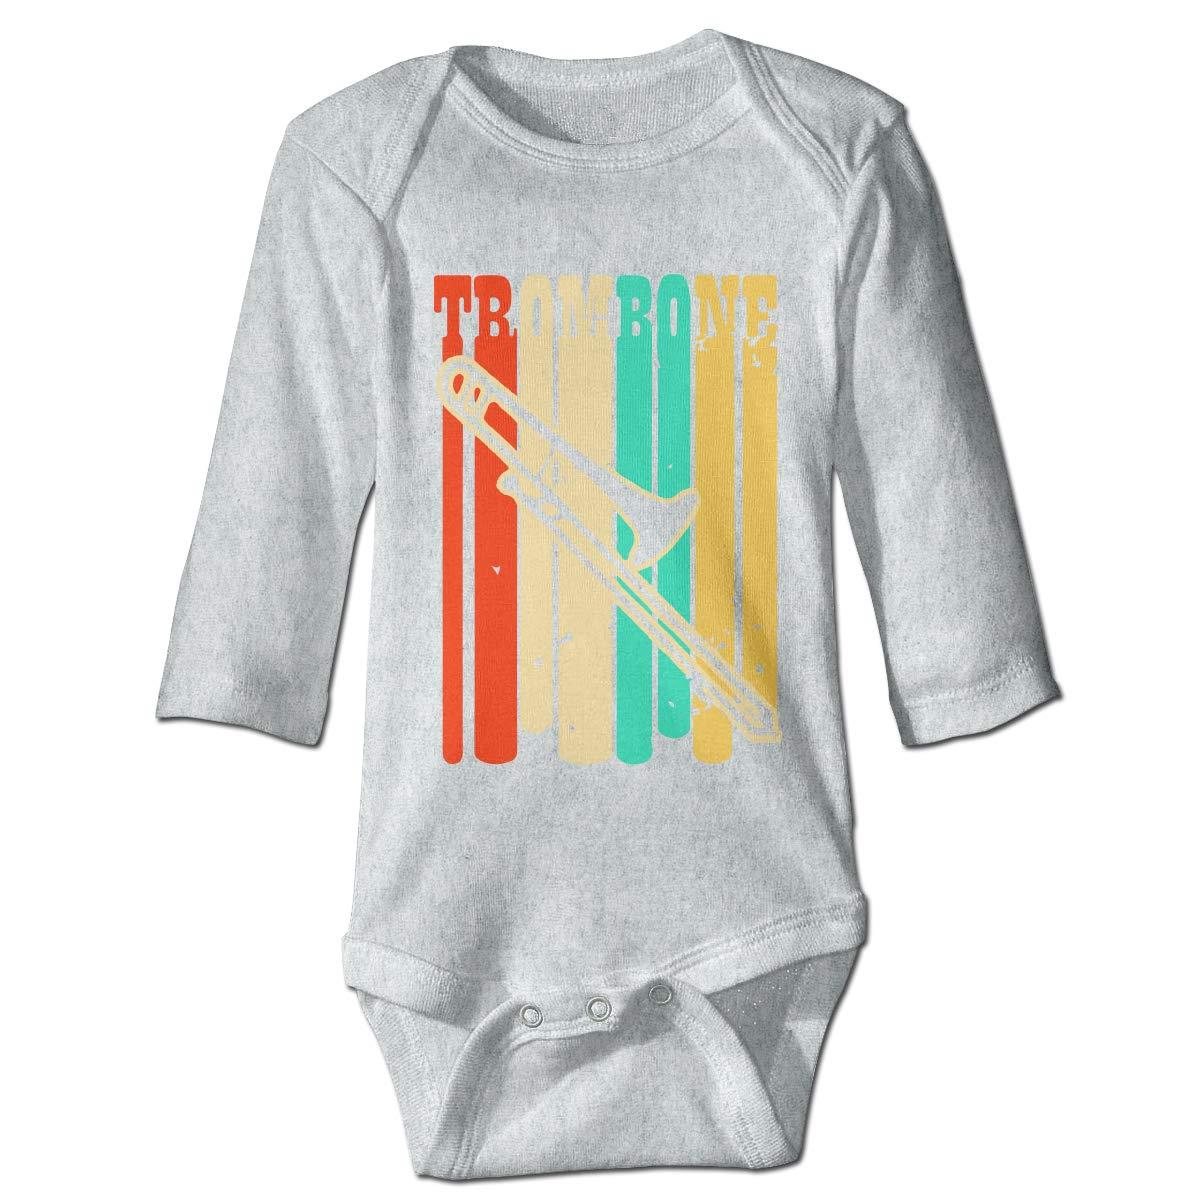 A14UBP Infant Babys Long Sleeve Baby Clothes Trombone Unisex Button Playsuit Outfit Clothes